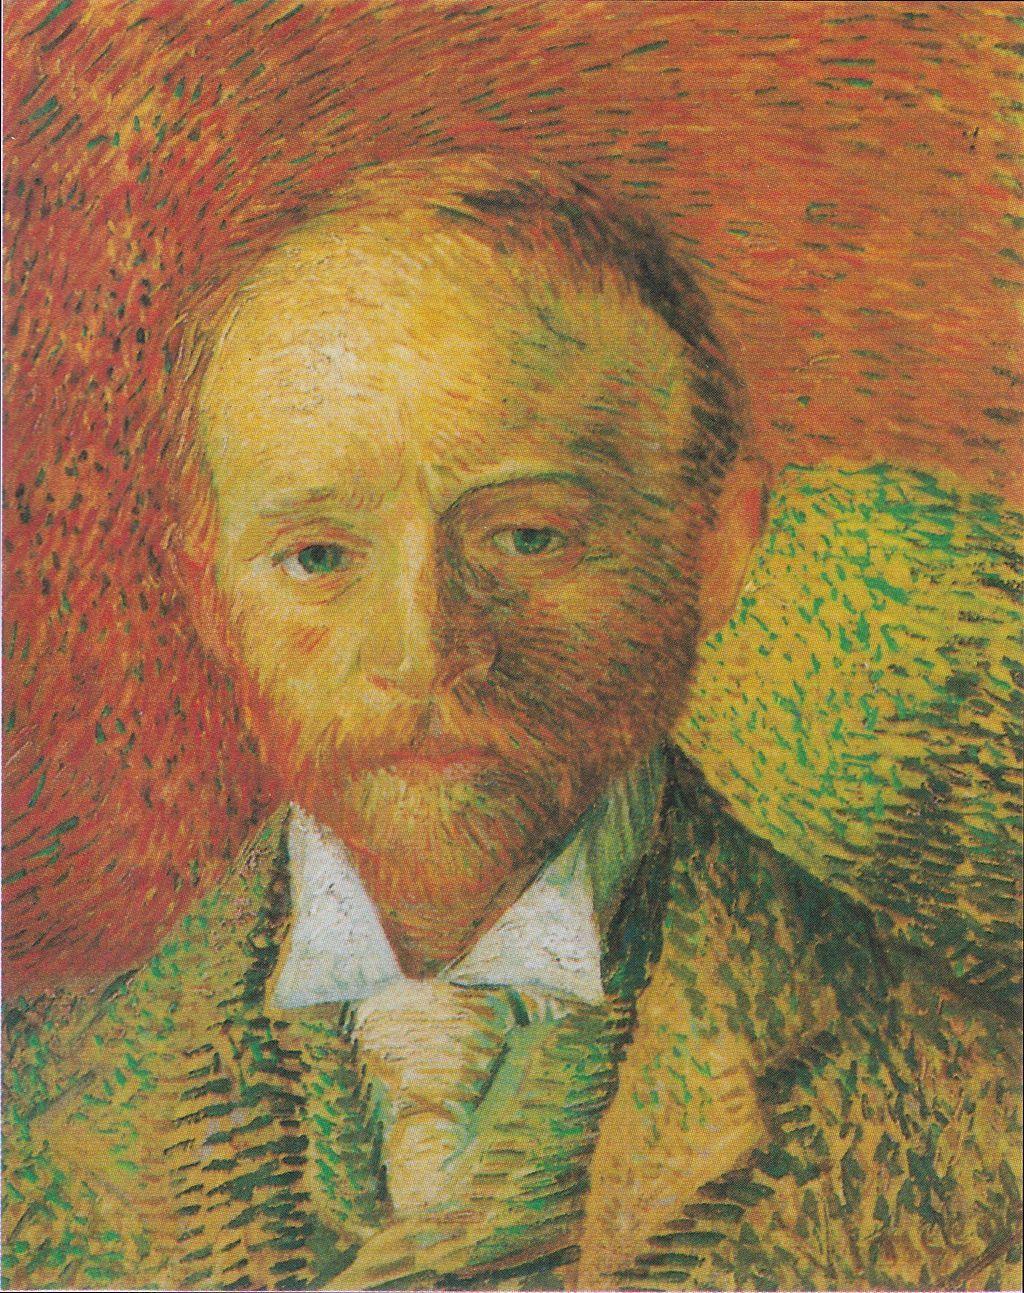 Van Gogh - Bildnis des Kunsthändlers Alexander Reid, 1887